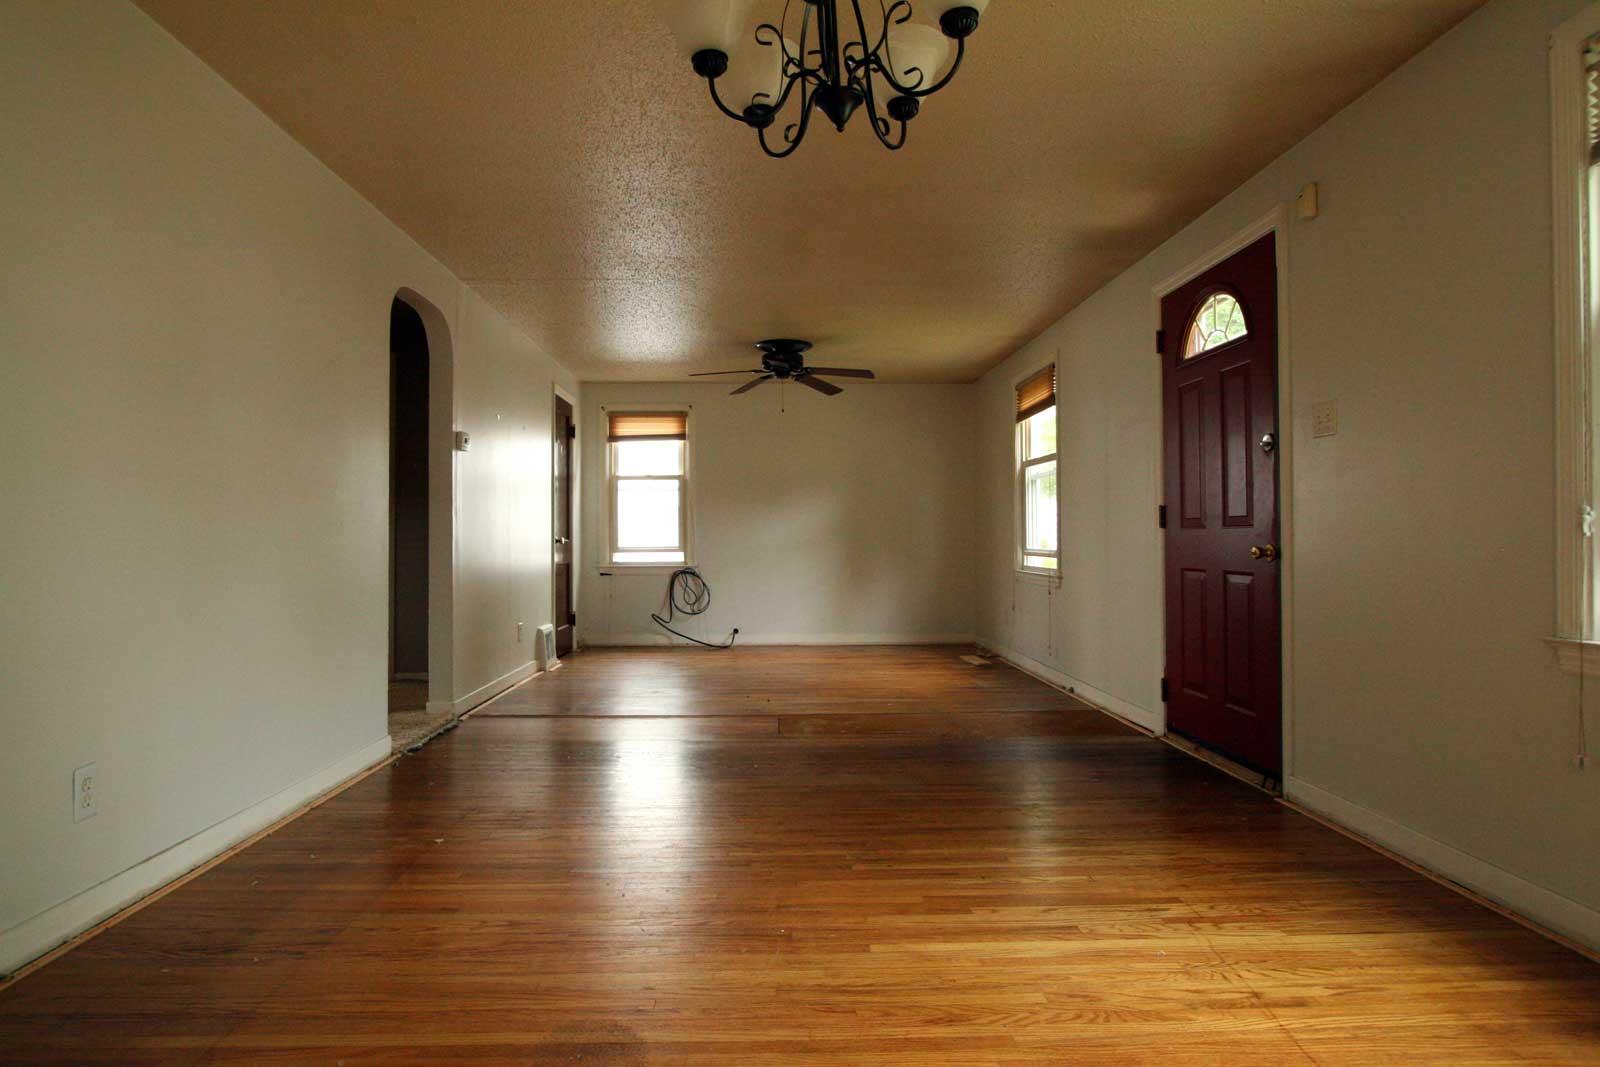 Living/dining space - wood floors under carpet